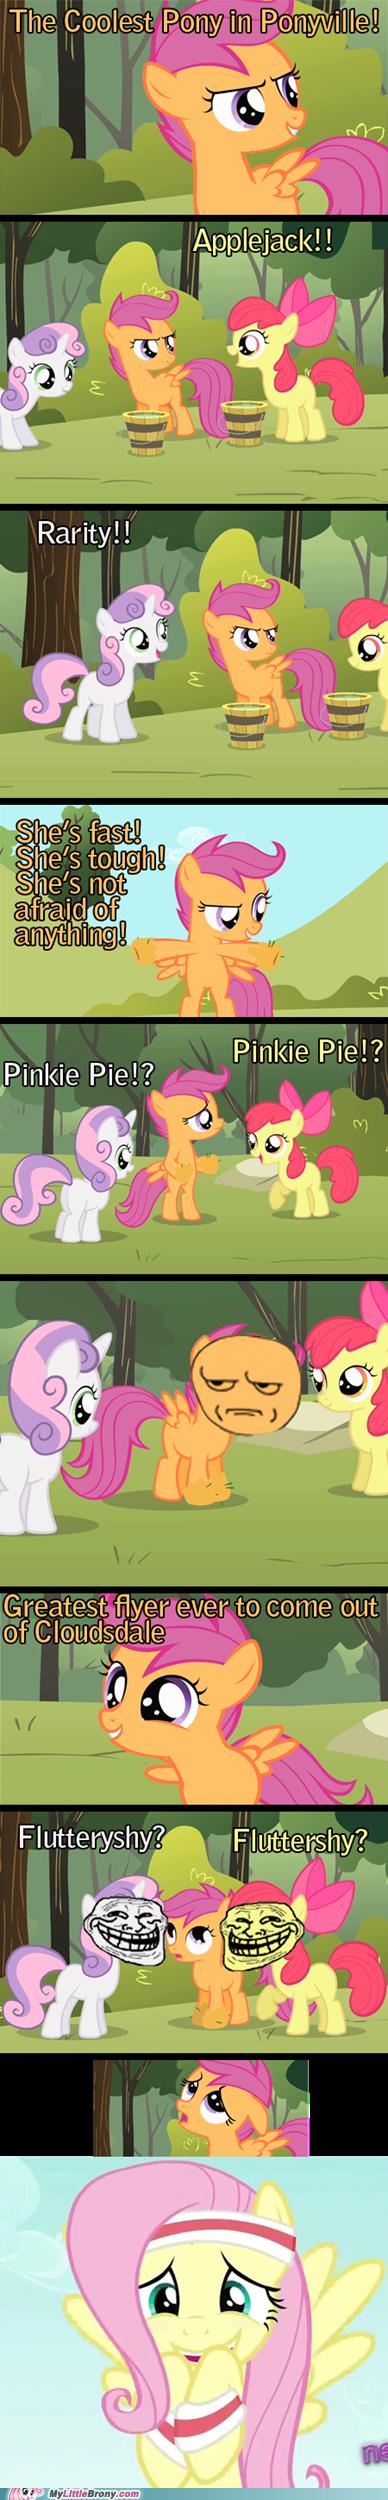 applejack comic comics fluttershy ponyville trolling - 6041001216